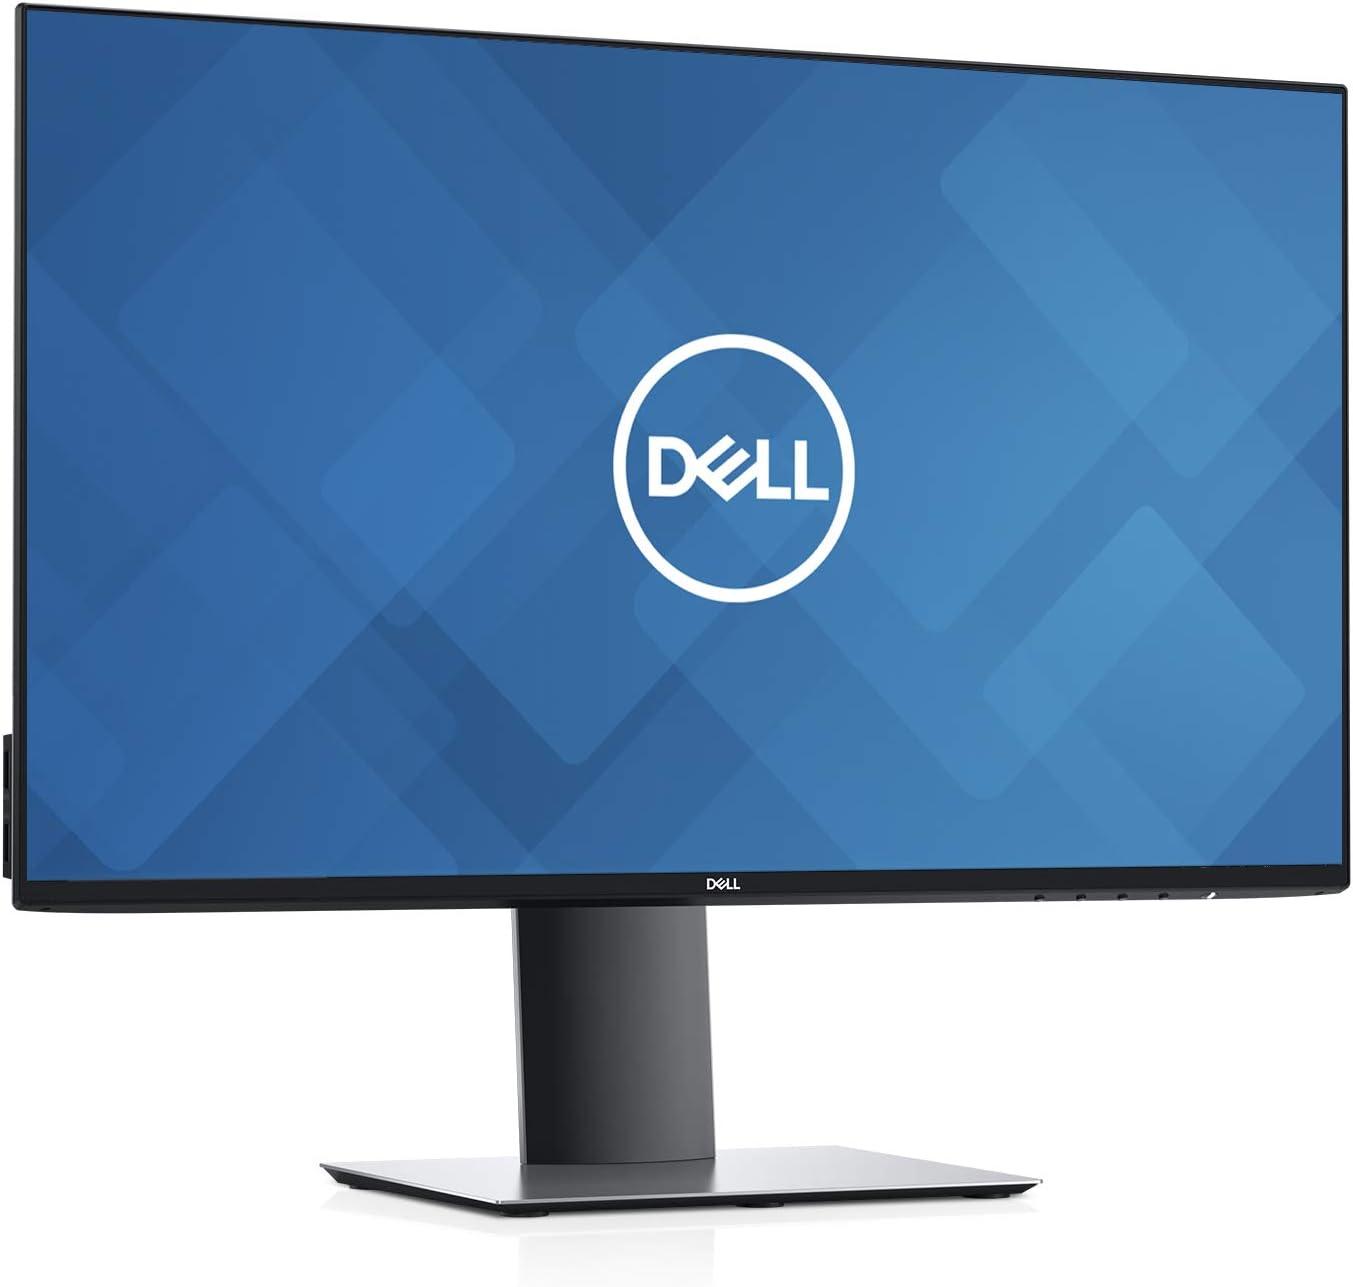 Dell Ultrasharp U2419HC Panel| 24 Inch Ultrathin| 1920 X 1080 @ 60Hz| FHD| IPS Technology| Vesa Mount Compatible, Black